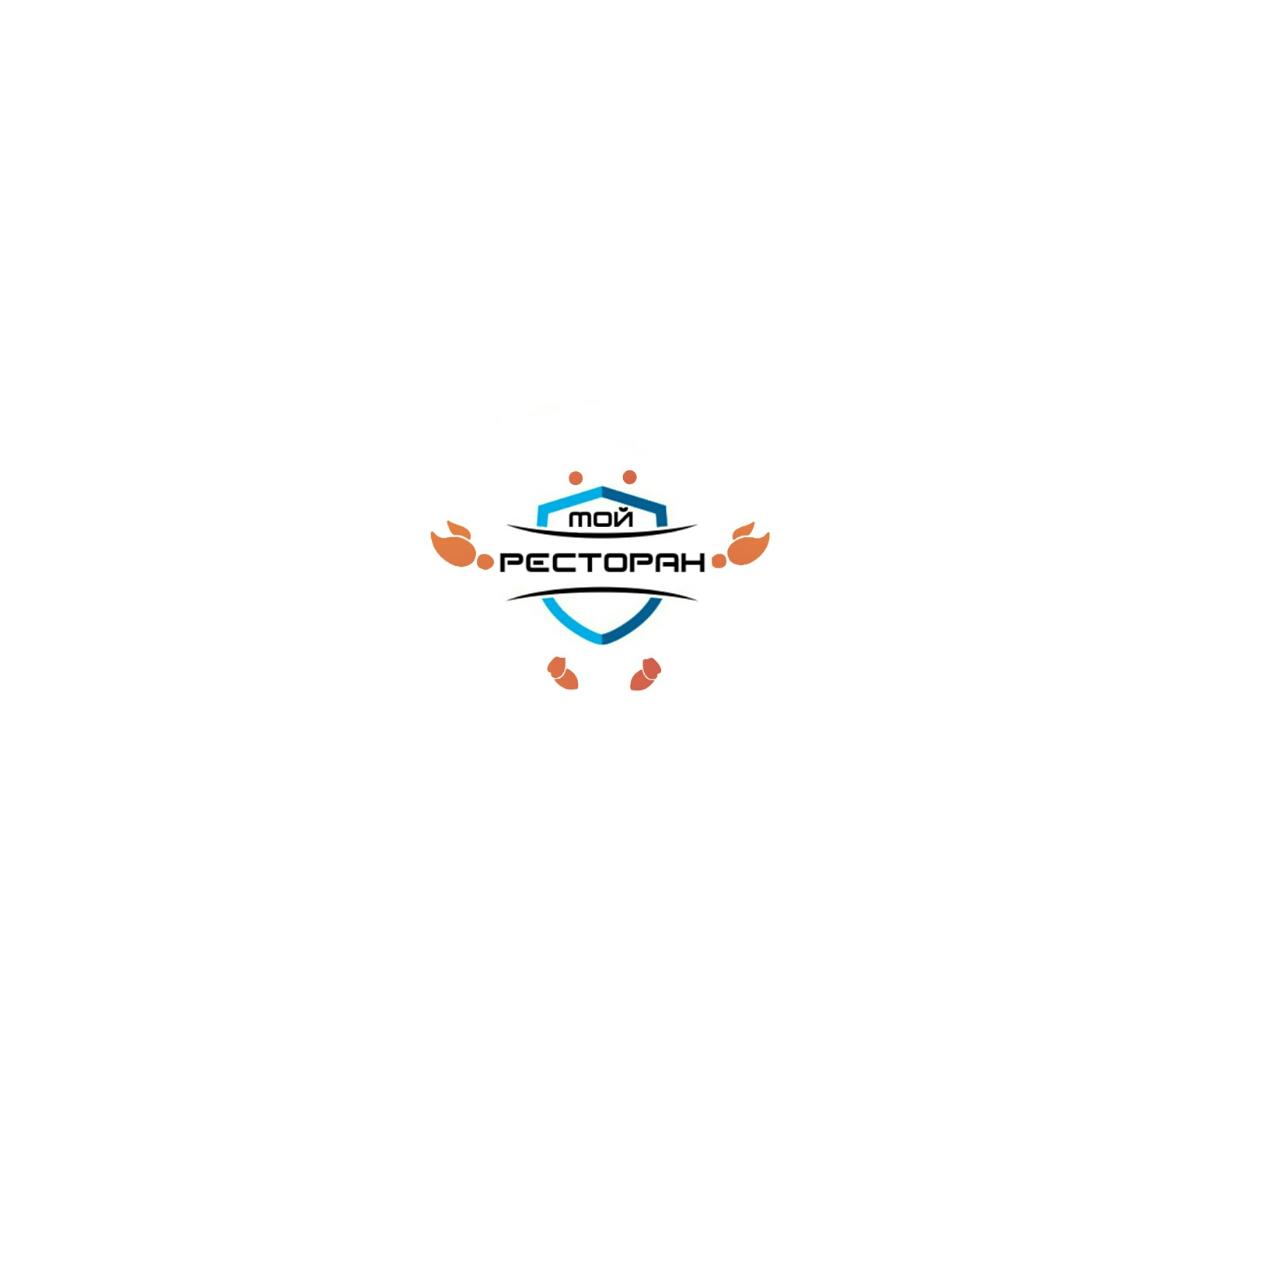 Разработать логотип и фавикон для IT- компании фото f_2955d53076745926.jpg